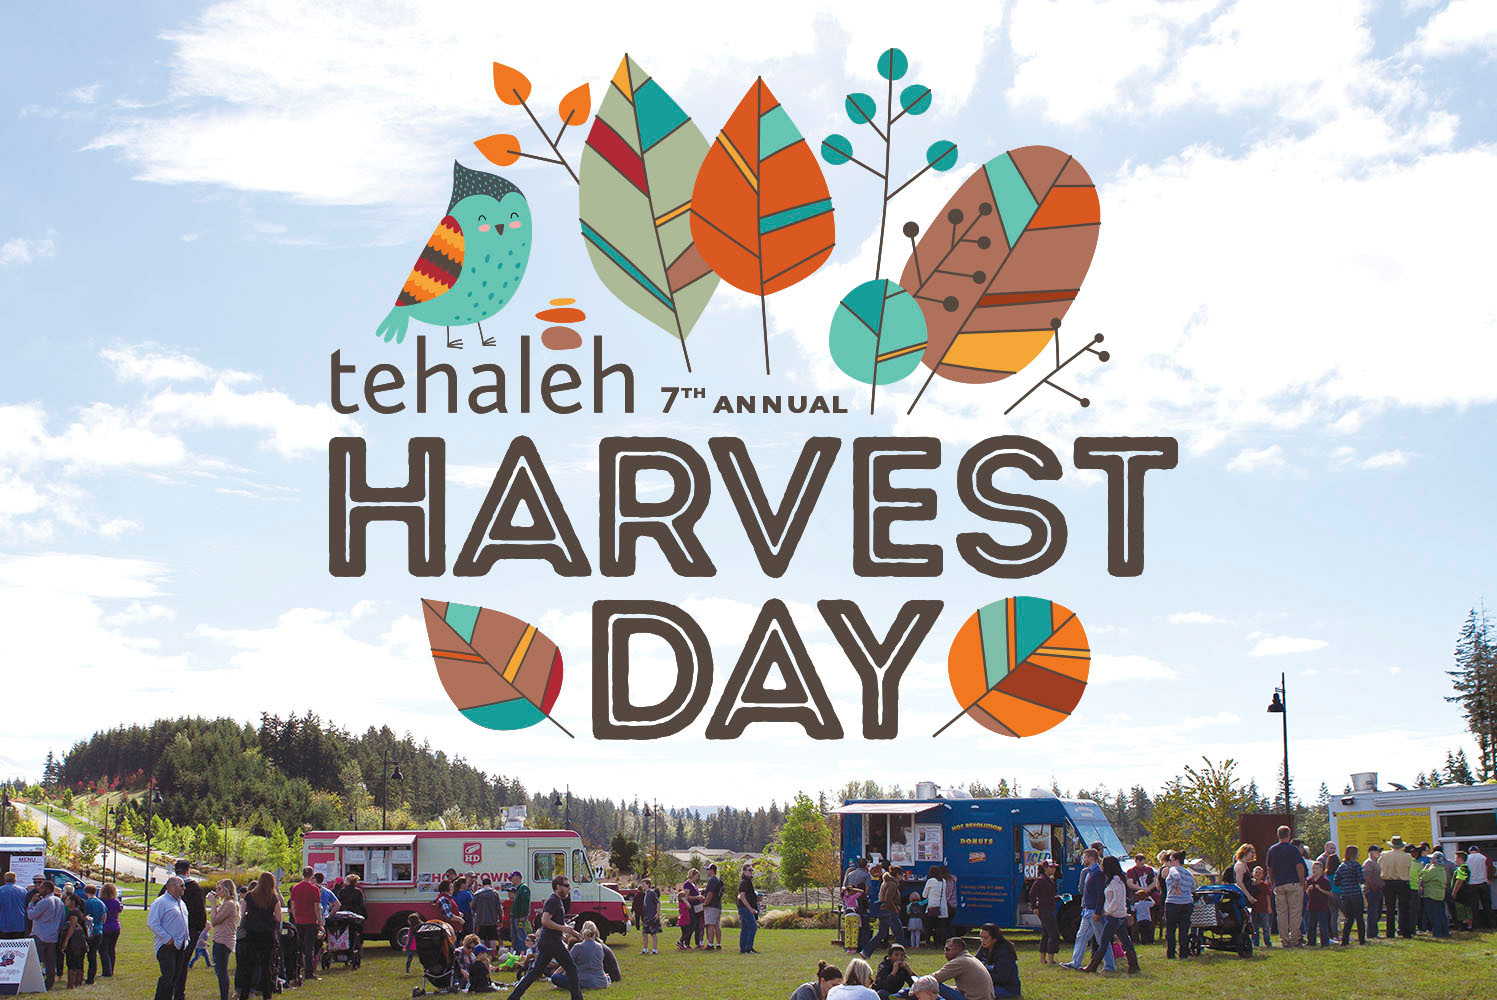 Tehaleh Harvest Day Promotion